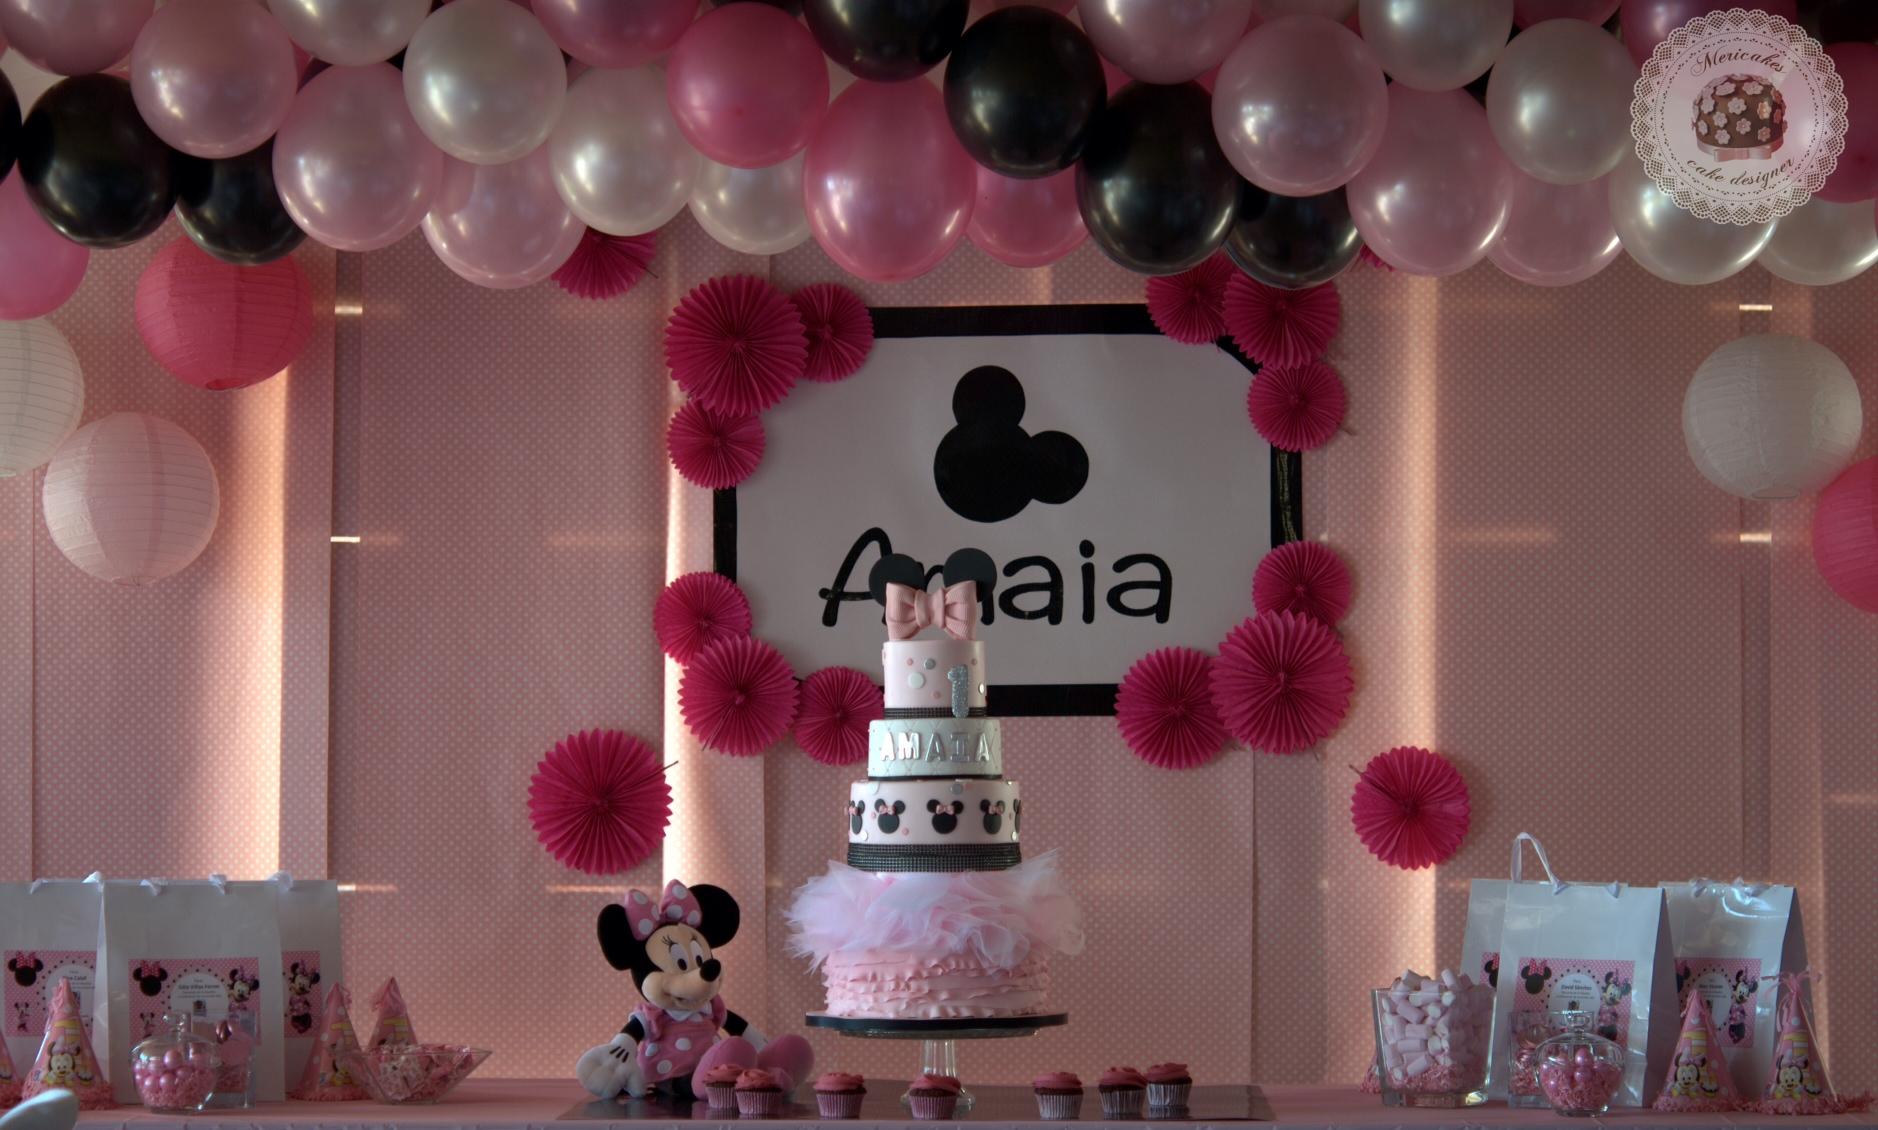 tarta-minnie-mousse-tartas-barcelona-tartas-decoradas-mericakes-tarta-infantil-disney-rosa-fondant-cumpleanos-vainilla-y-frambuesas-4